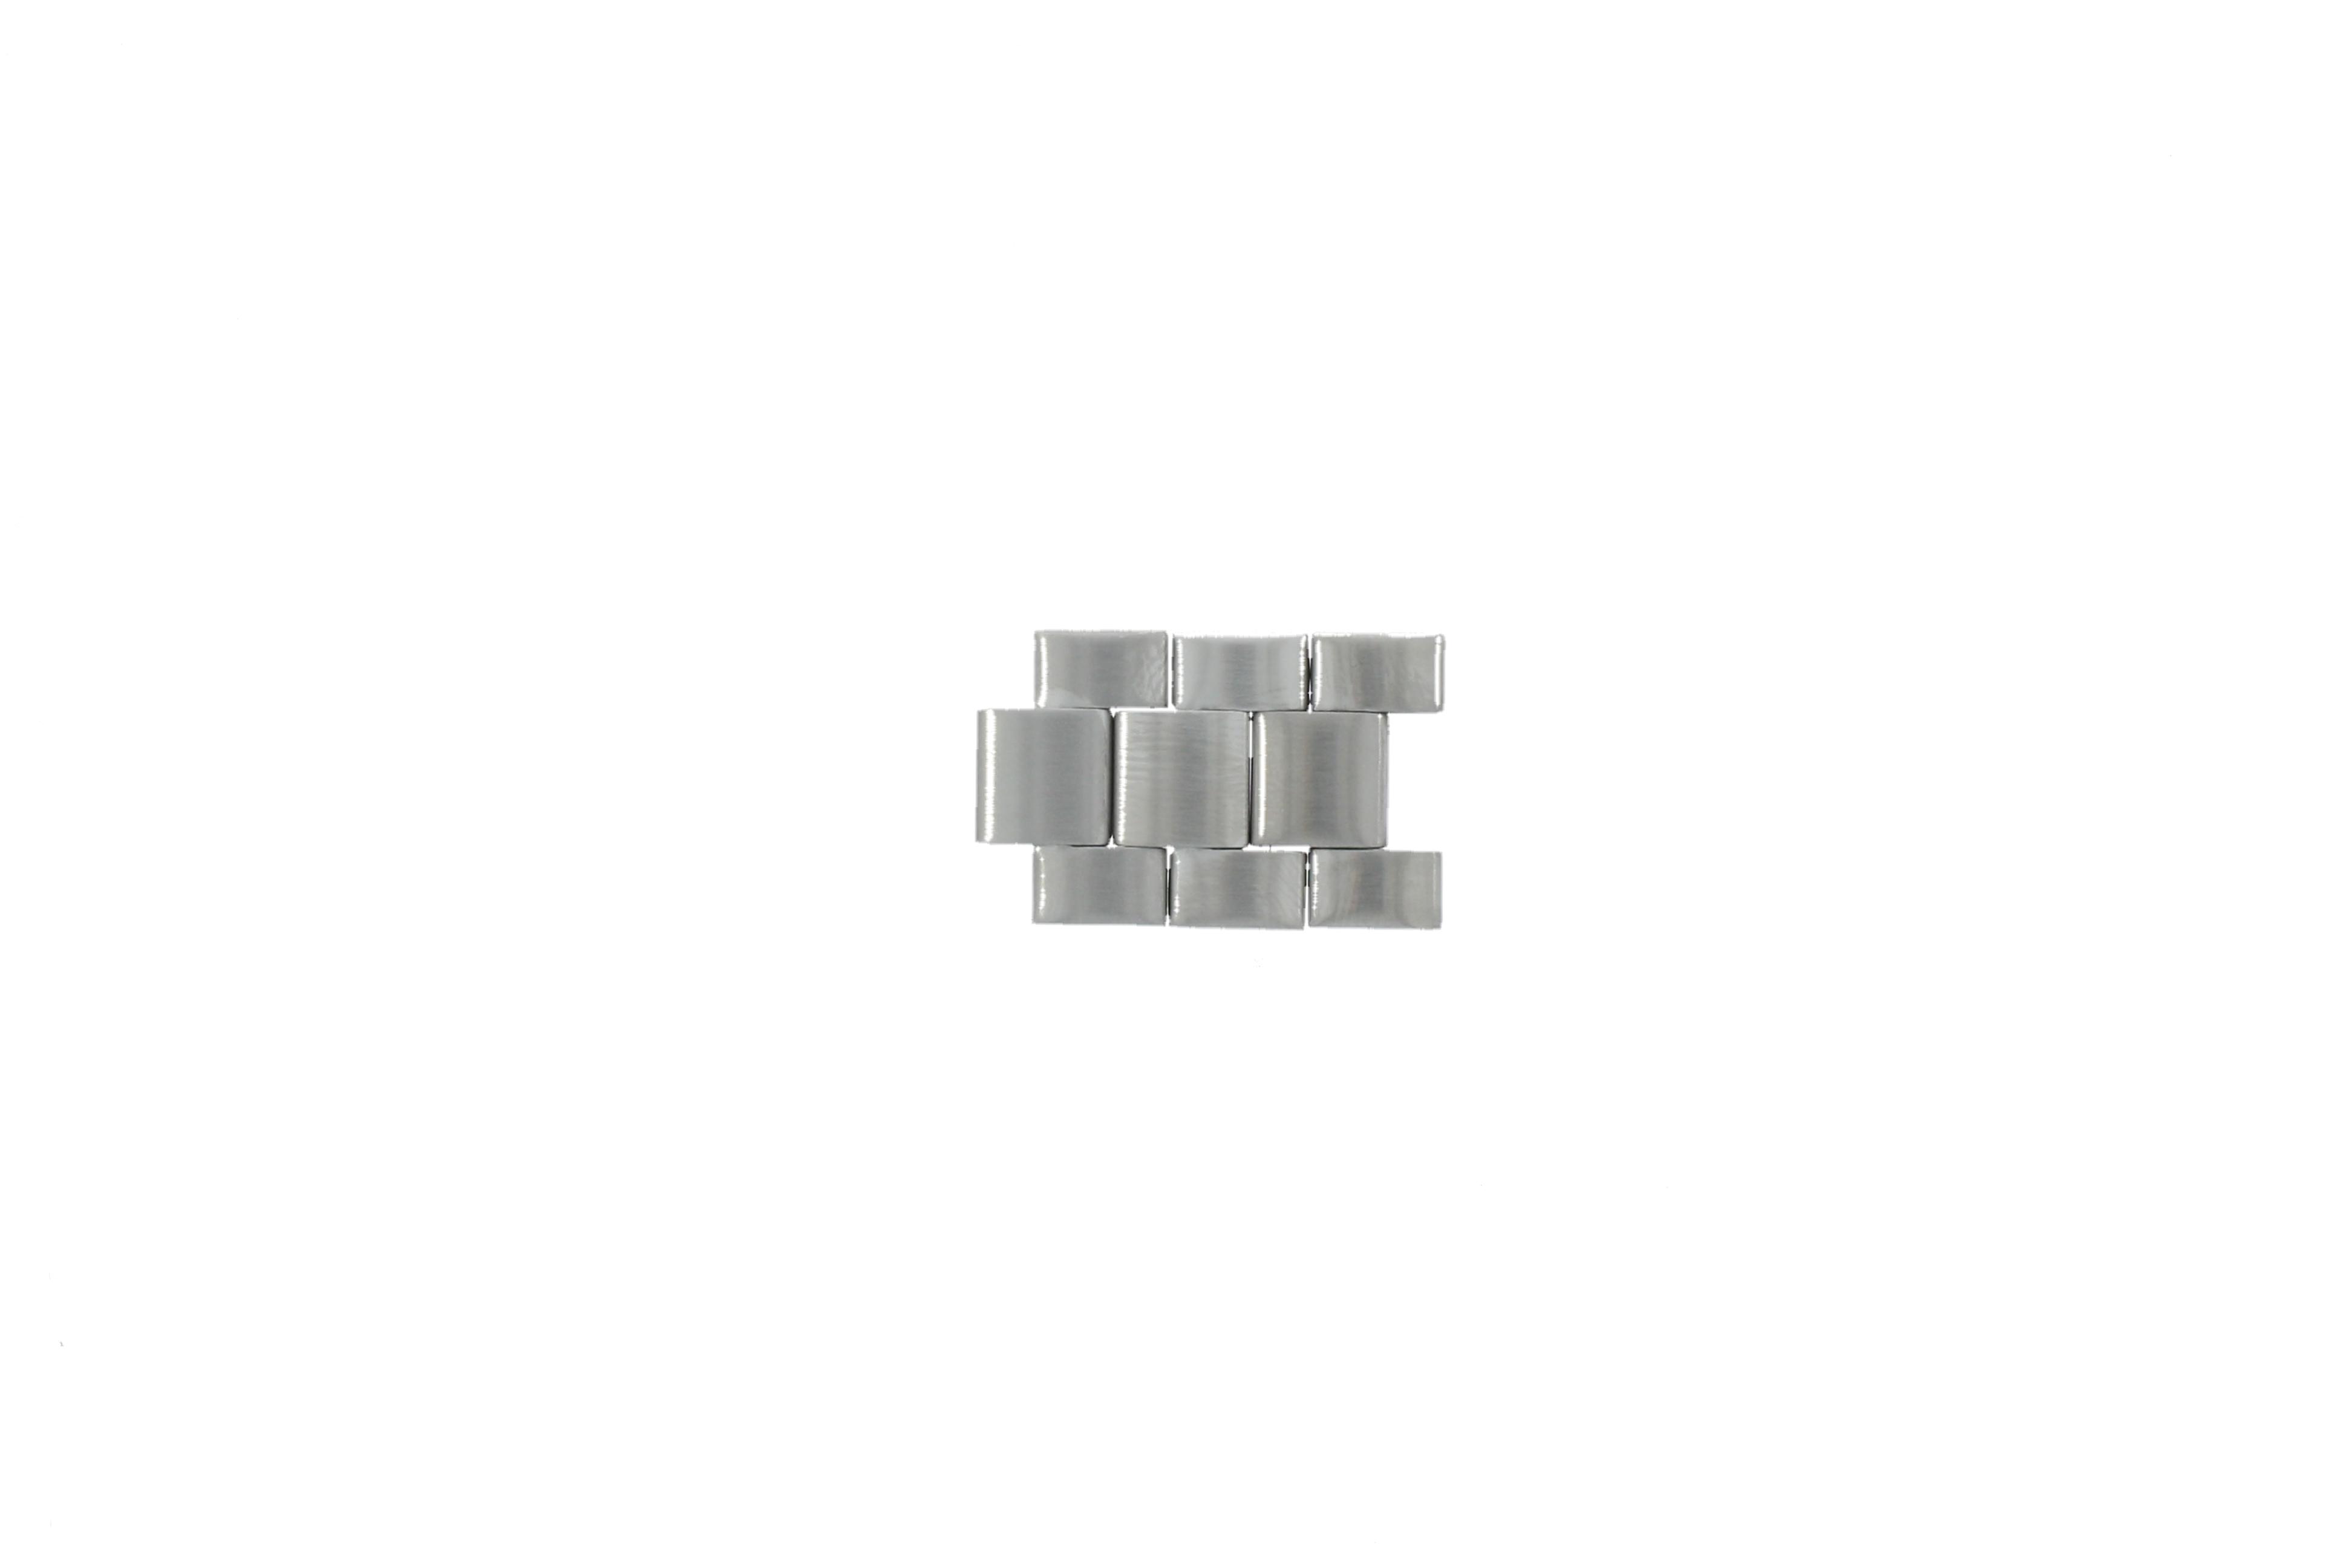 Fossil Klocklänkar CH2600 / 25XXXX - 22mmmm - (3 stycken)